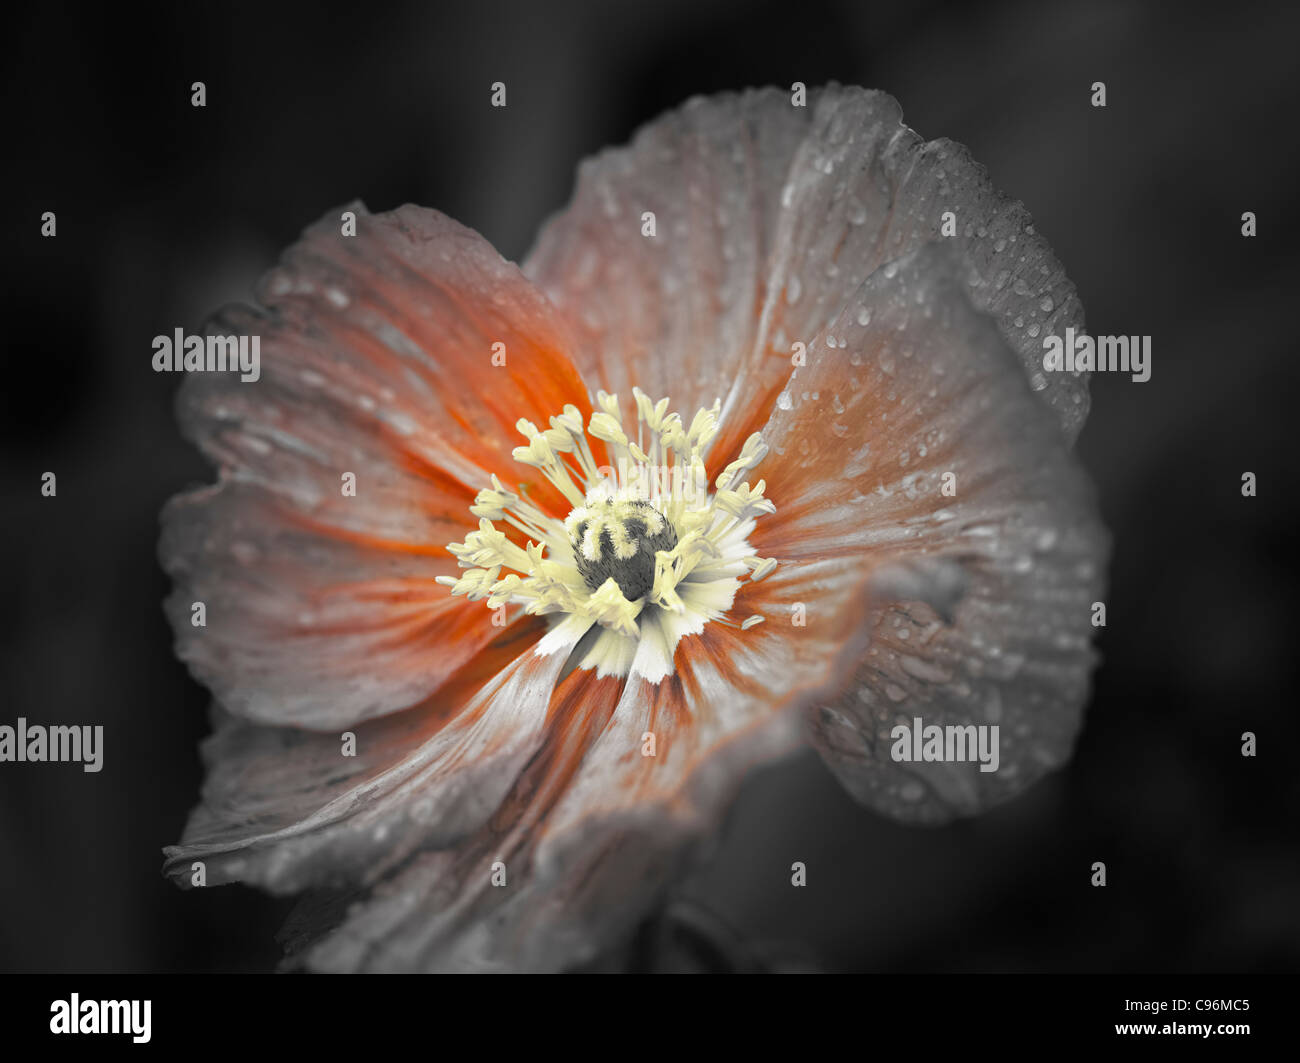 Poppy flower stock photos poppy flower stock images alamy close up of poppy flower after rain oregon stock image mightylinksfo